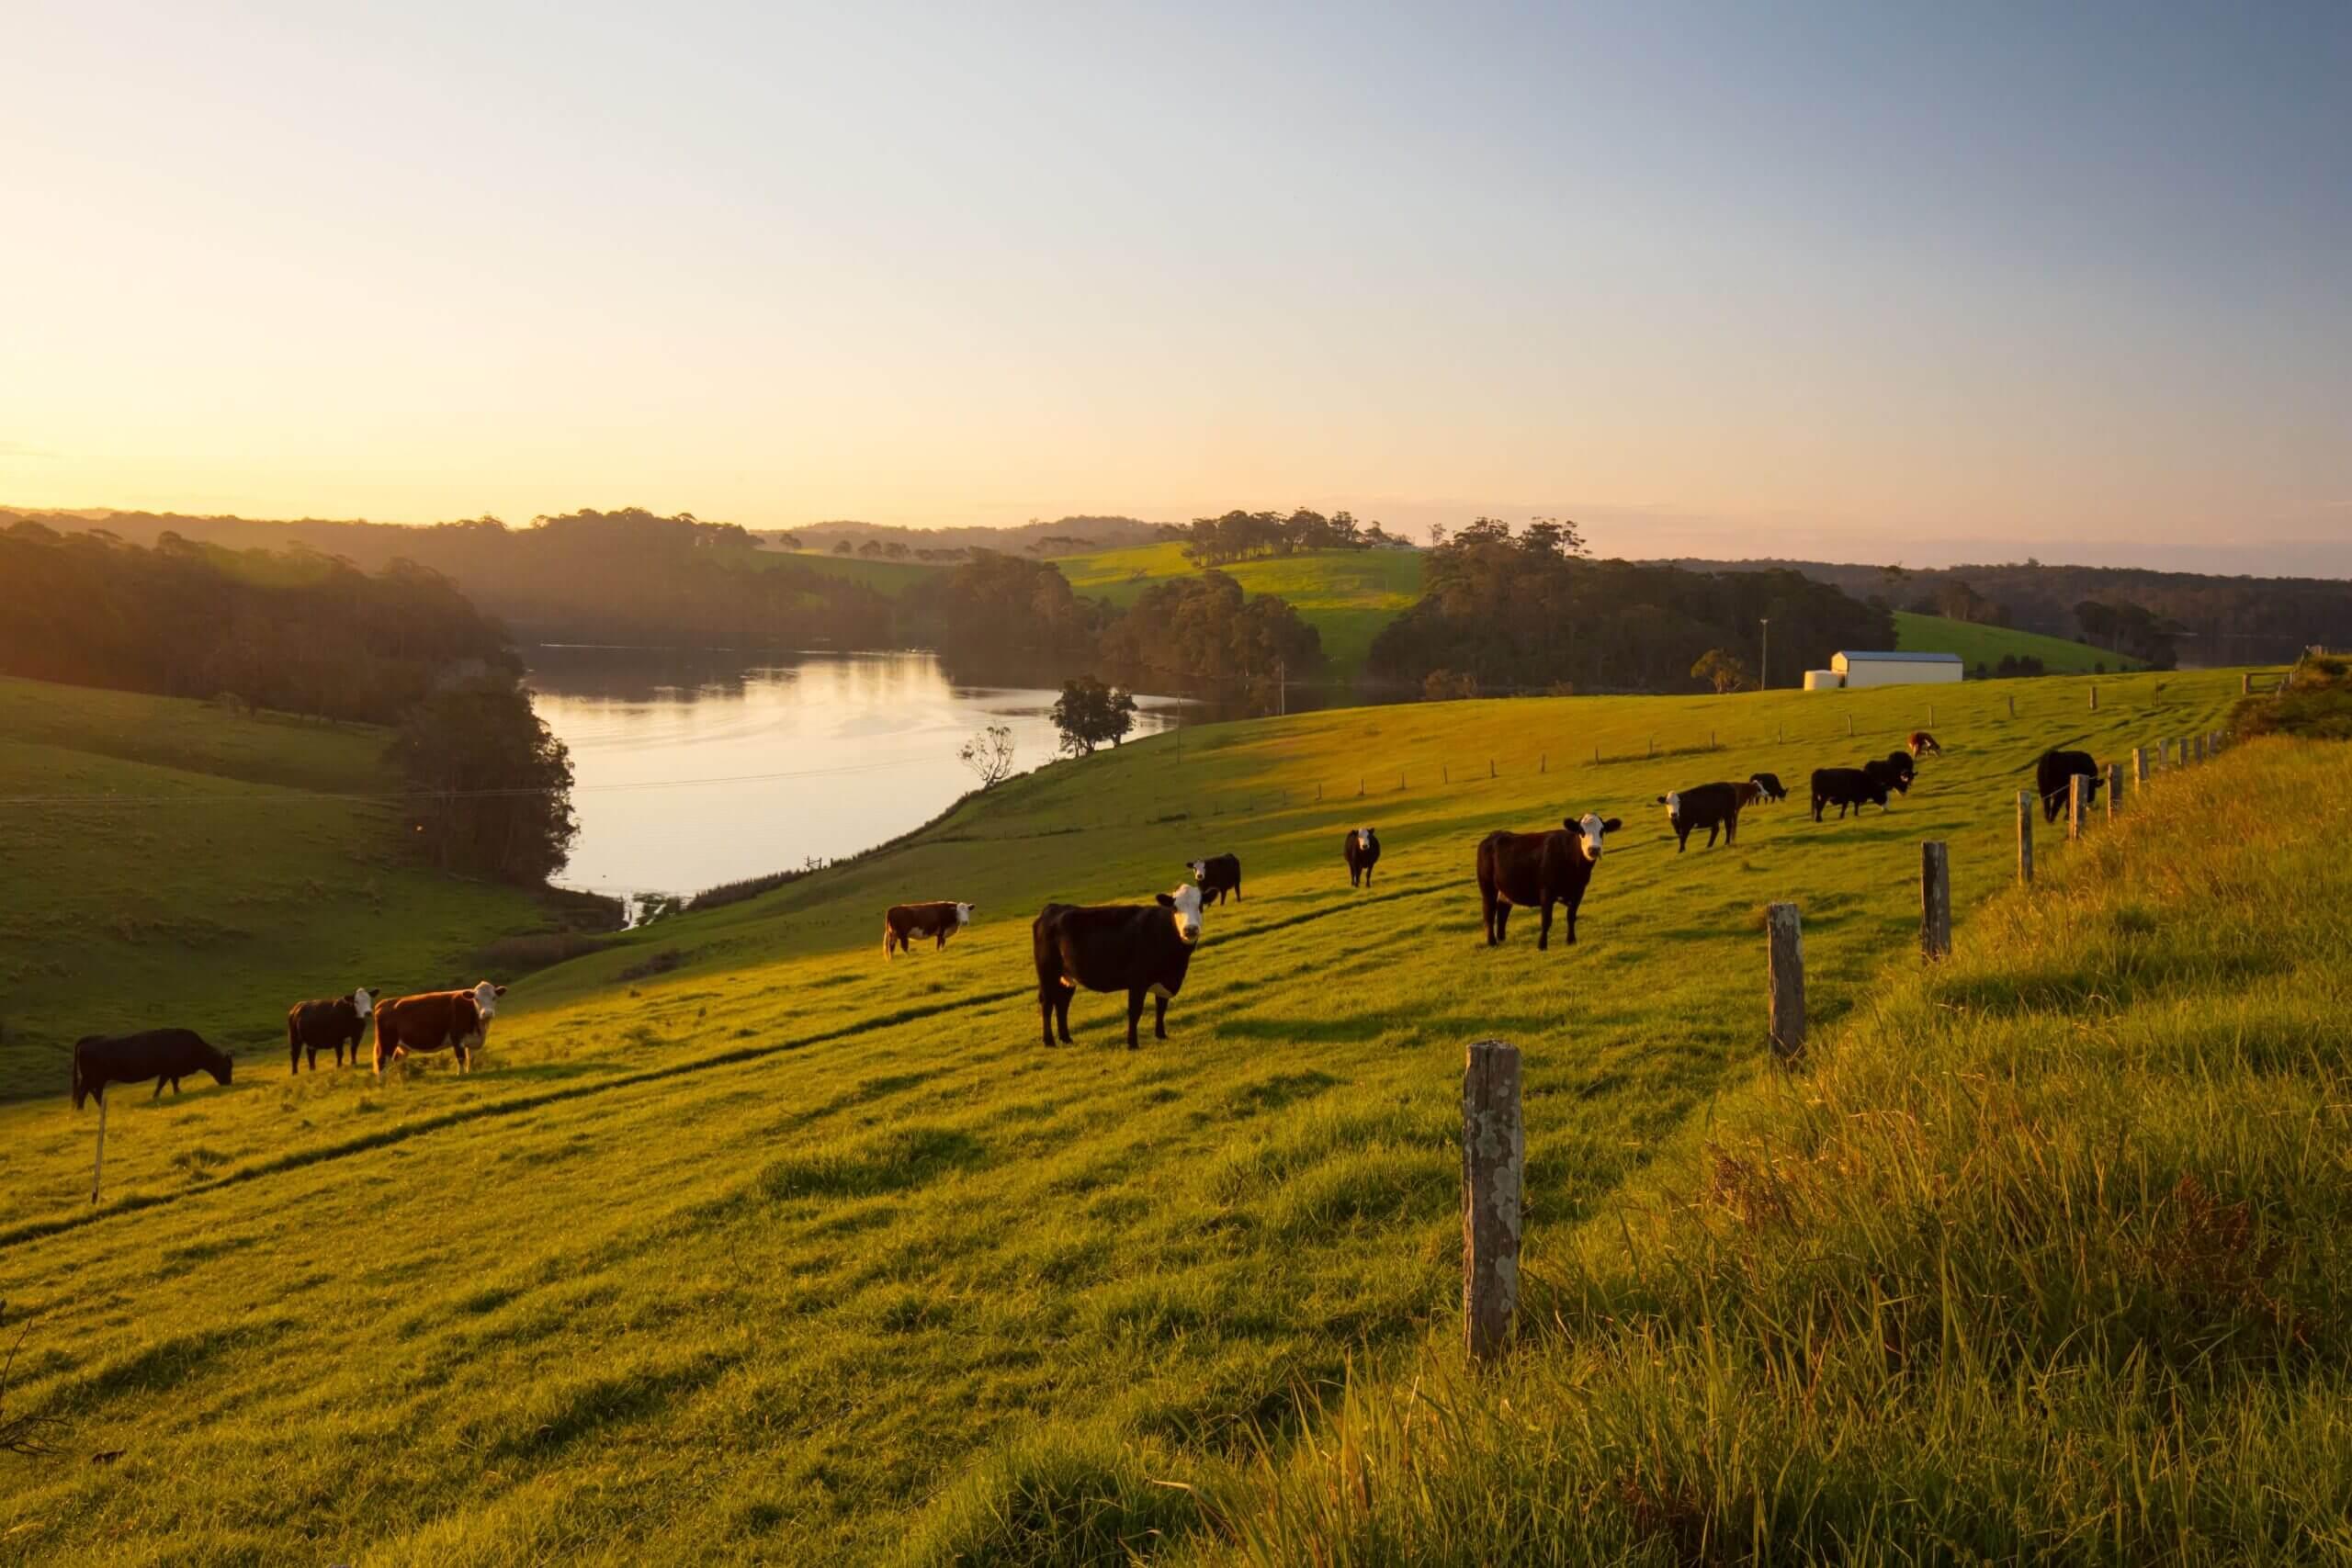 Rural Property Loans